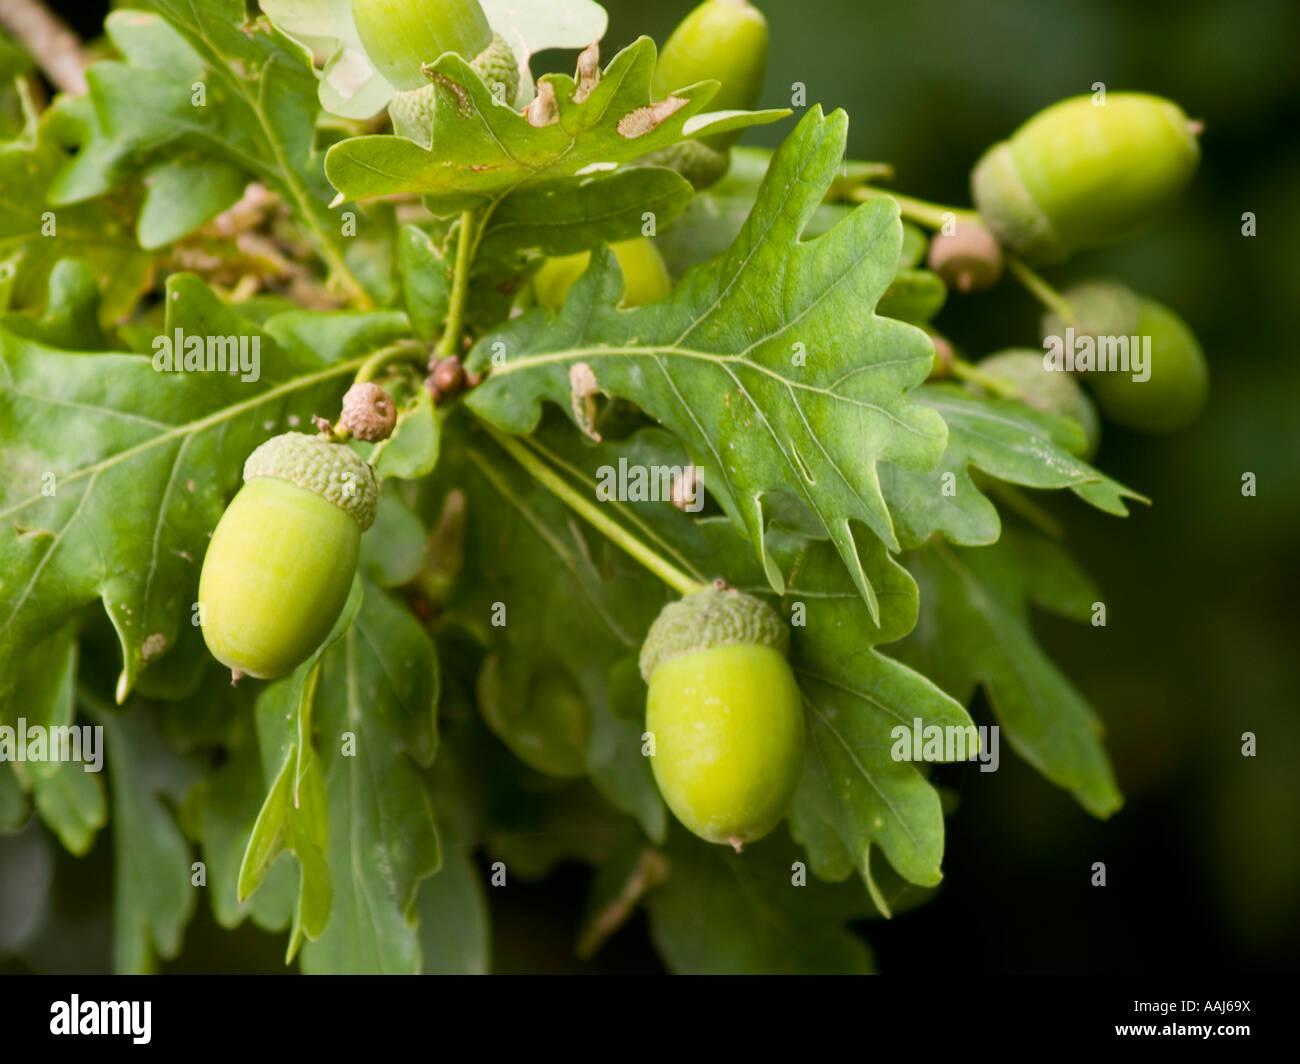 Planting Live Oak Tree Acorns : Freshly growing acorns of the english oak tree quercus